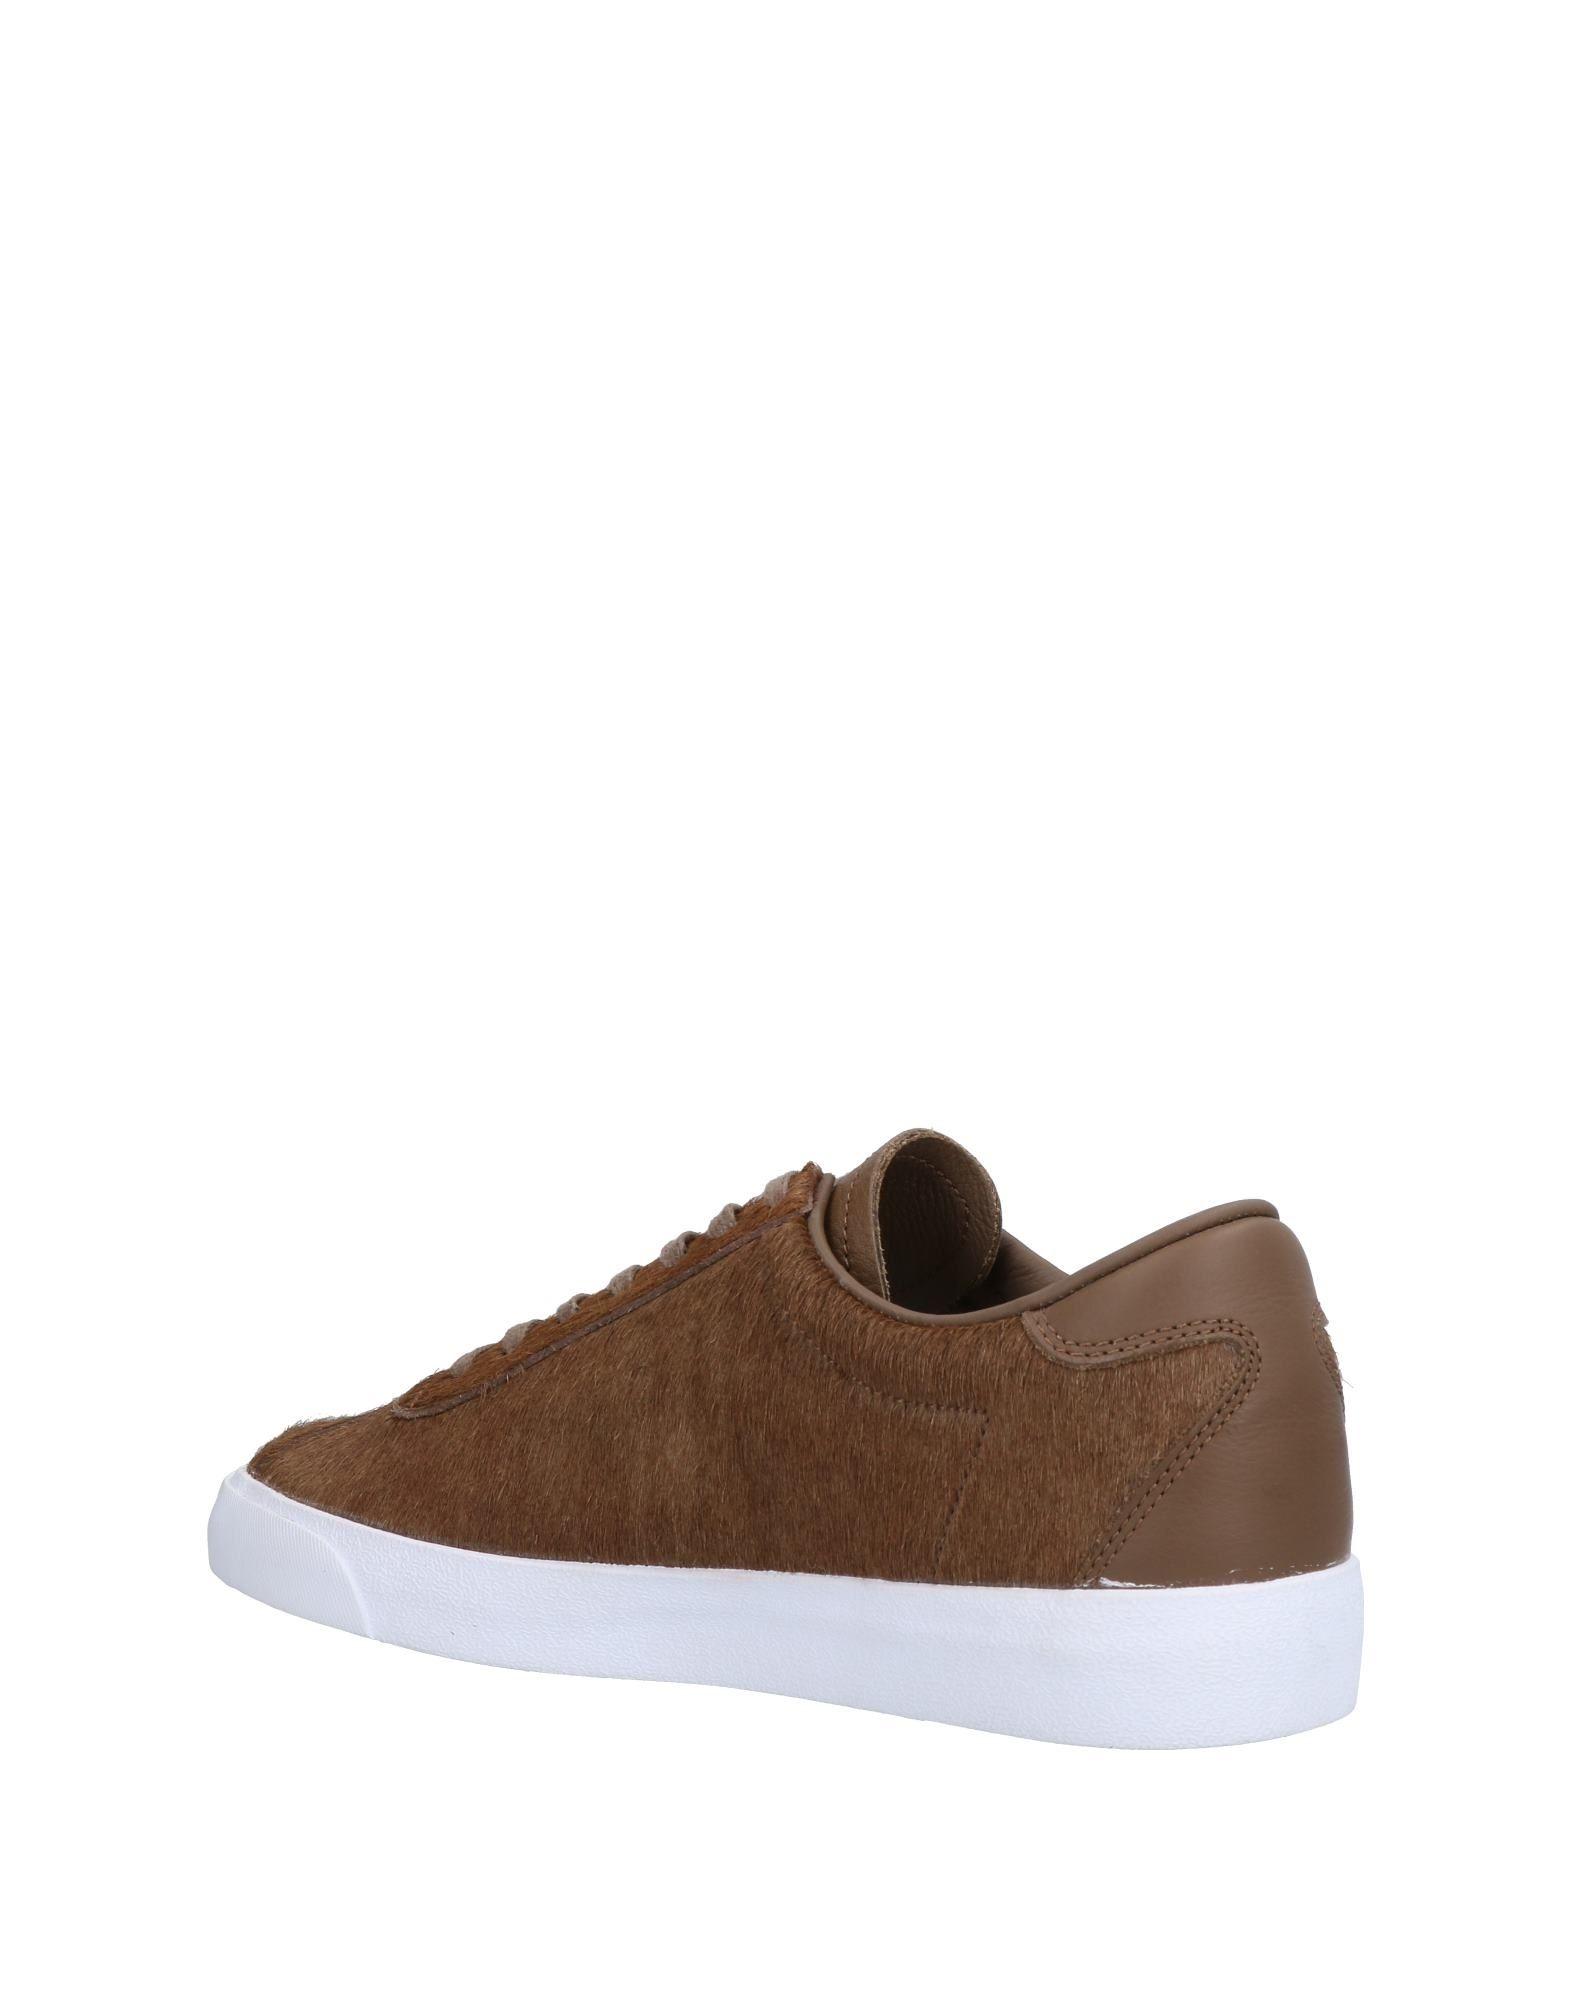 Rabatt Herren echte Schuhe Nike Sneakers Herren Rabatt  11509869NB 19da59